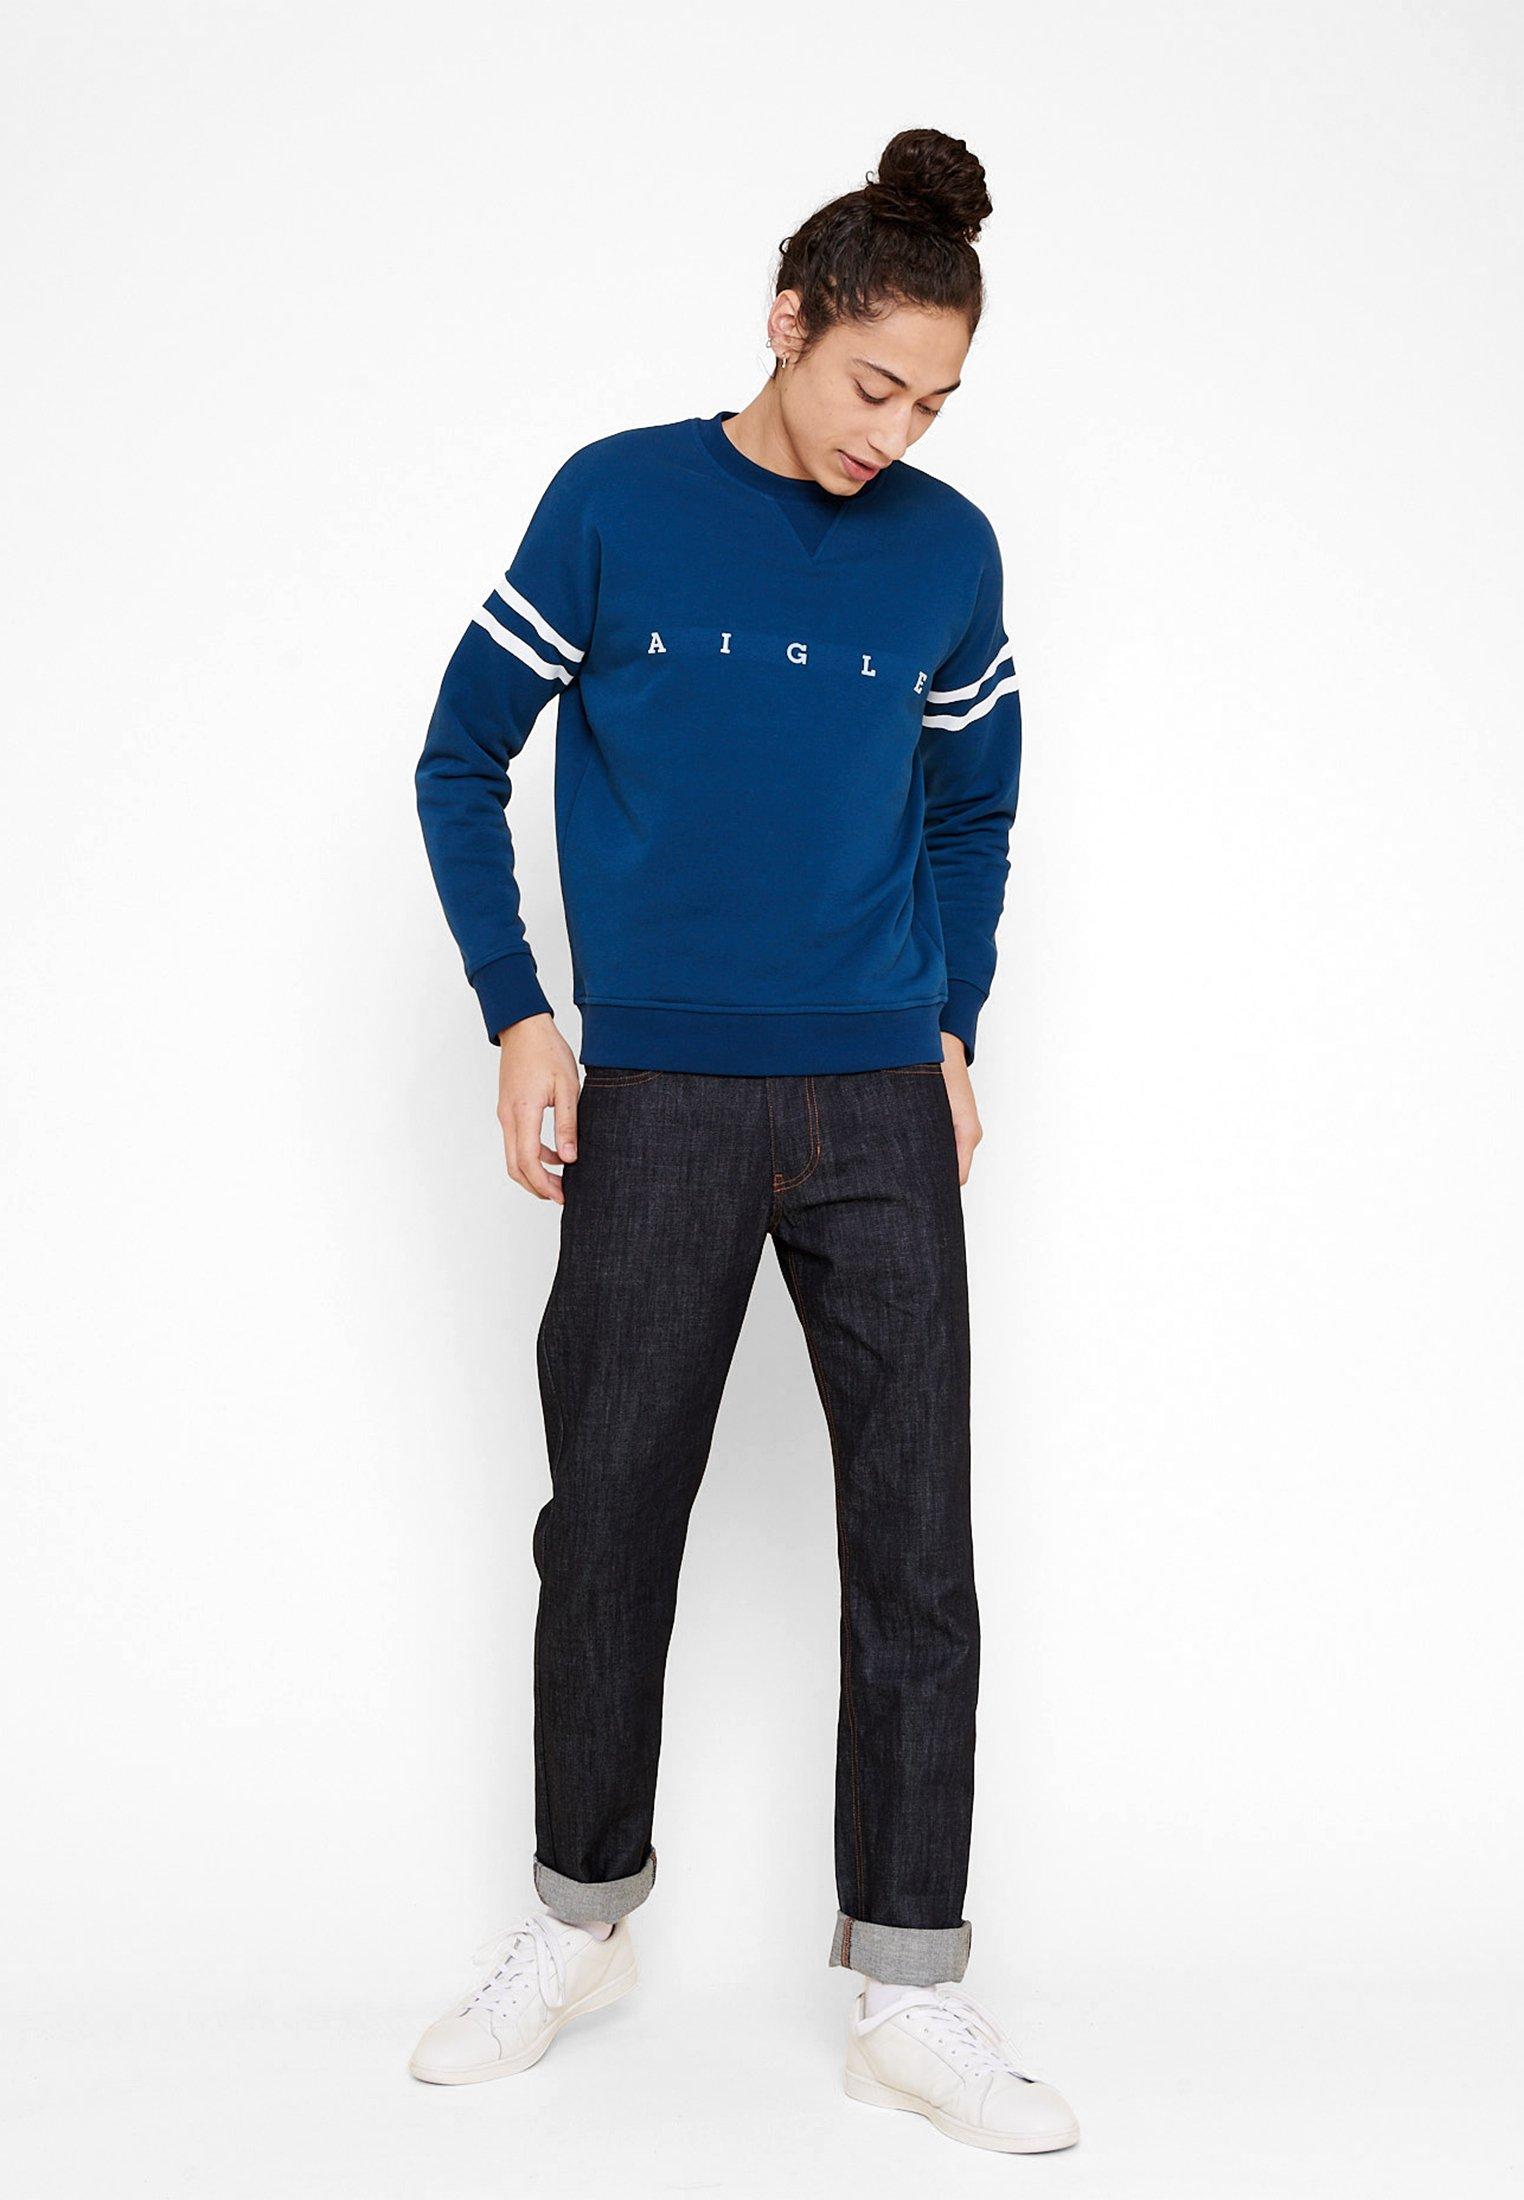 Aigle WANDRI - Sweatshirt - blue/white